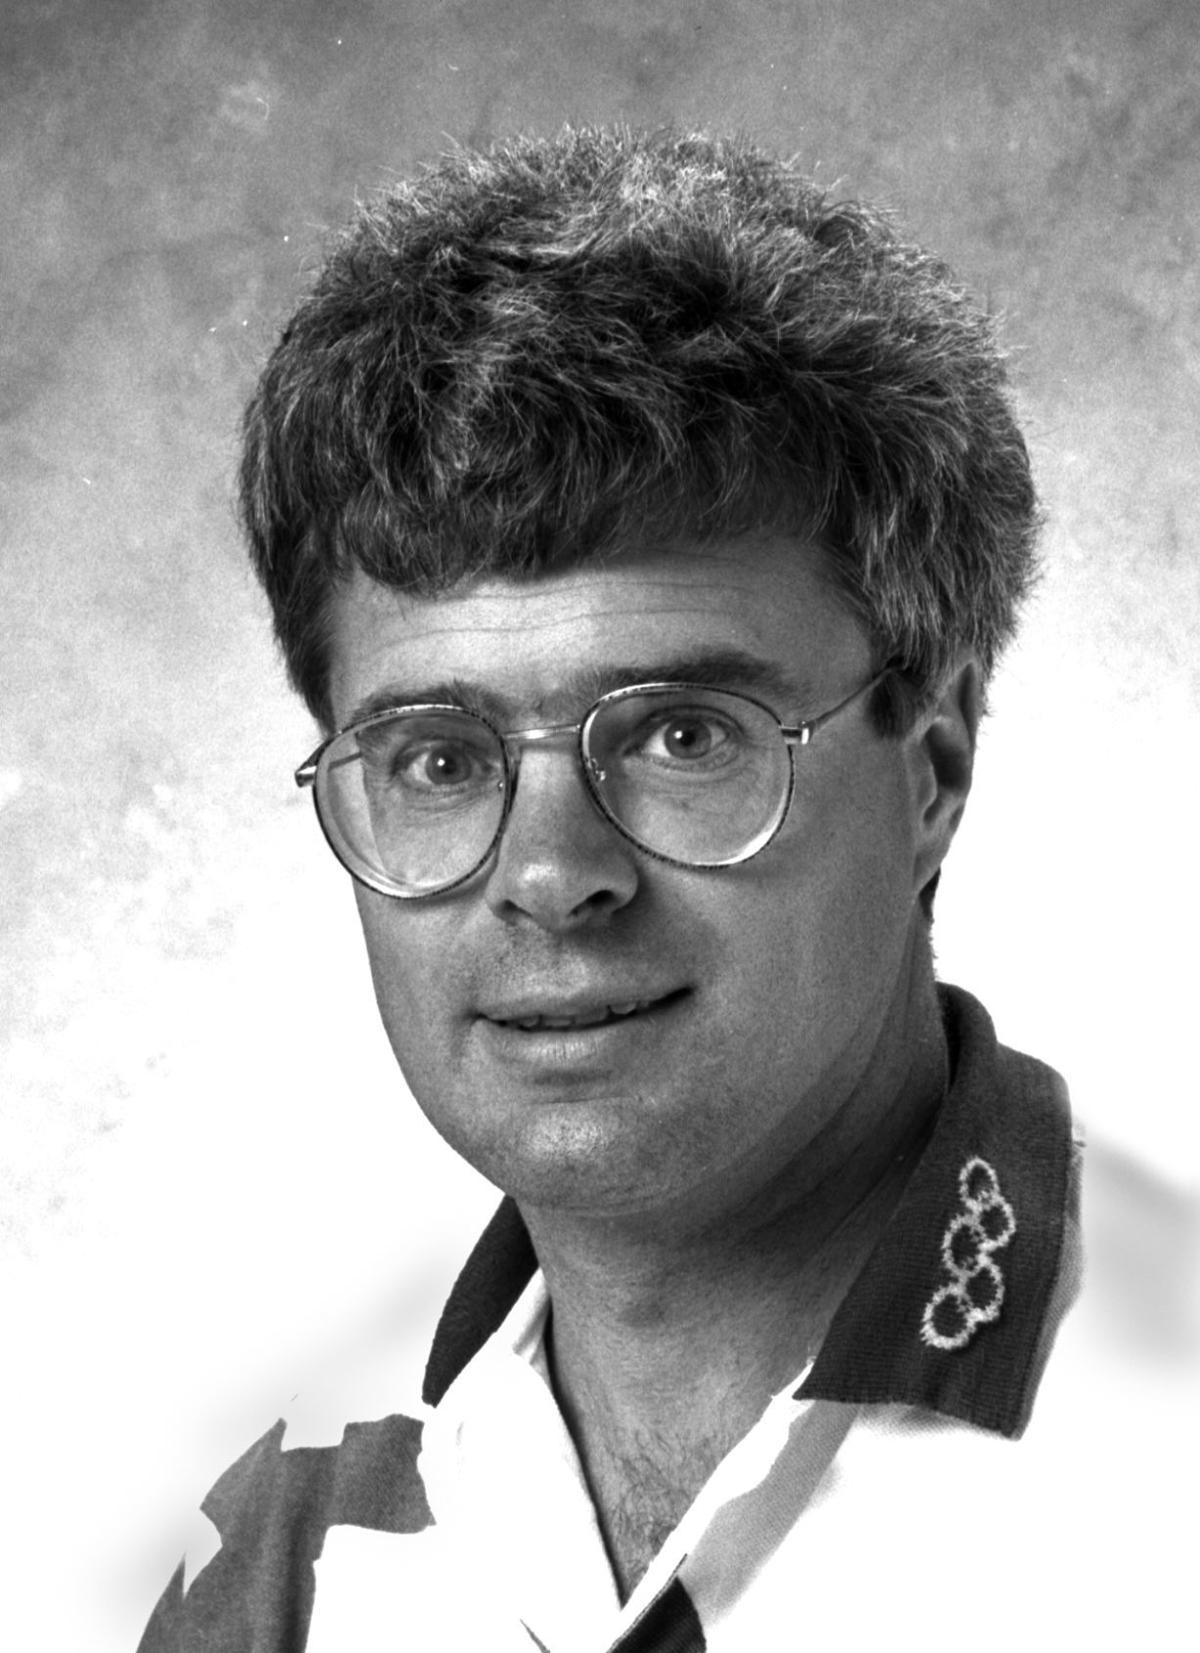 Steve Terry mugshot